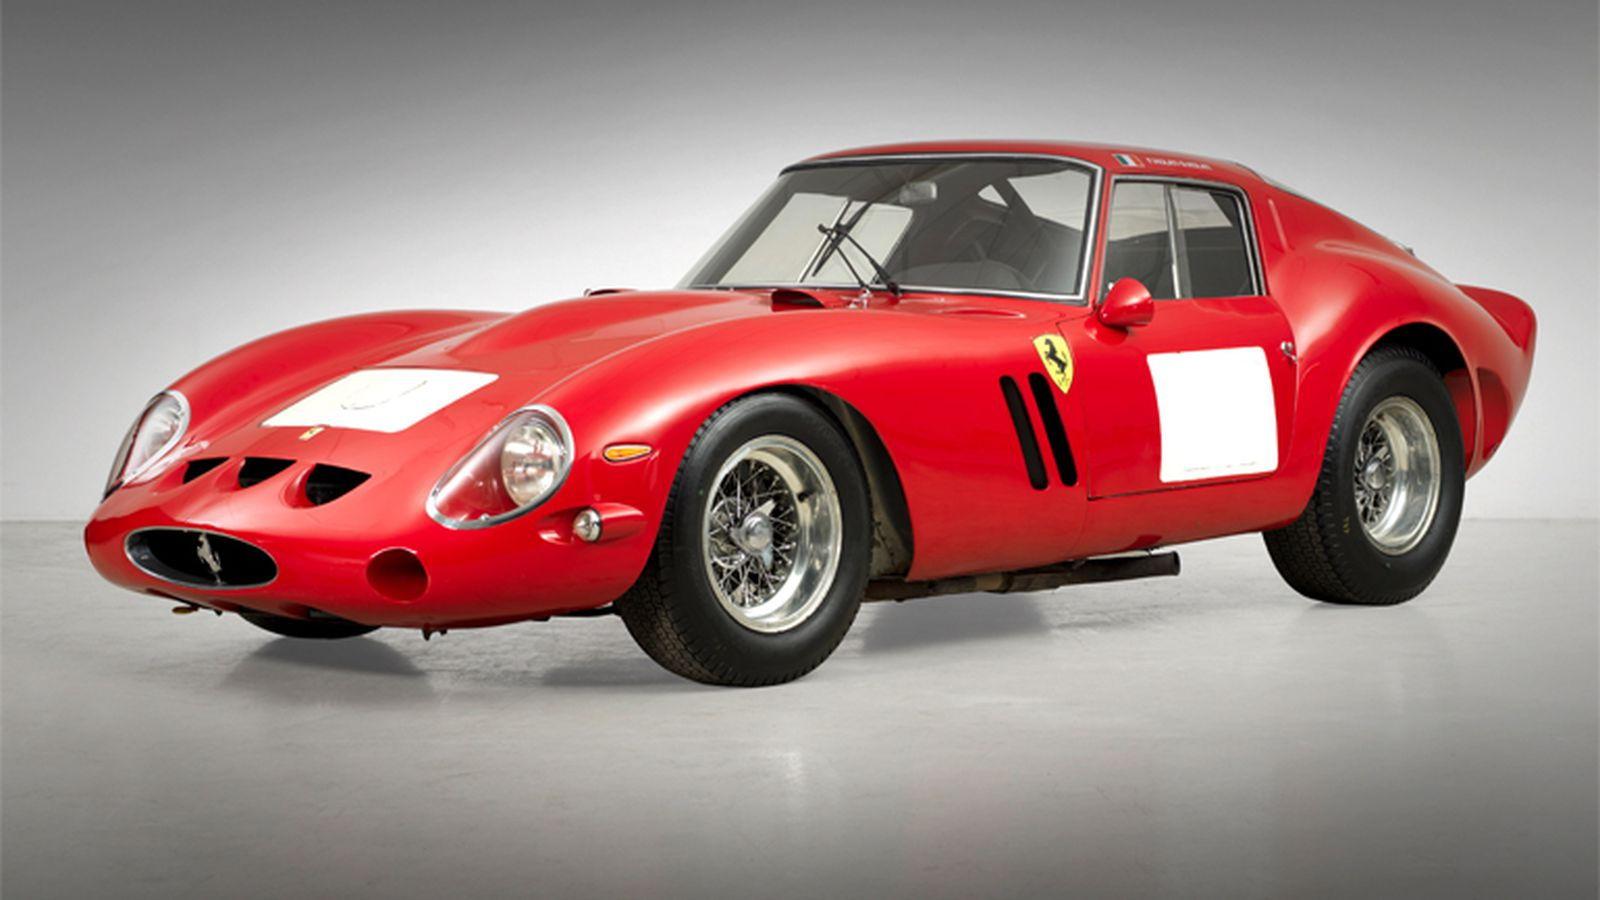 5 Dream Ferraris We All Want to Own